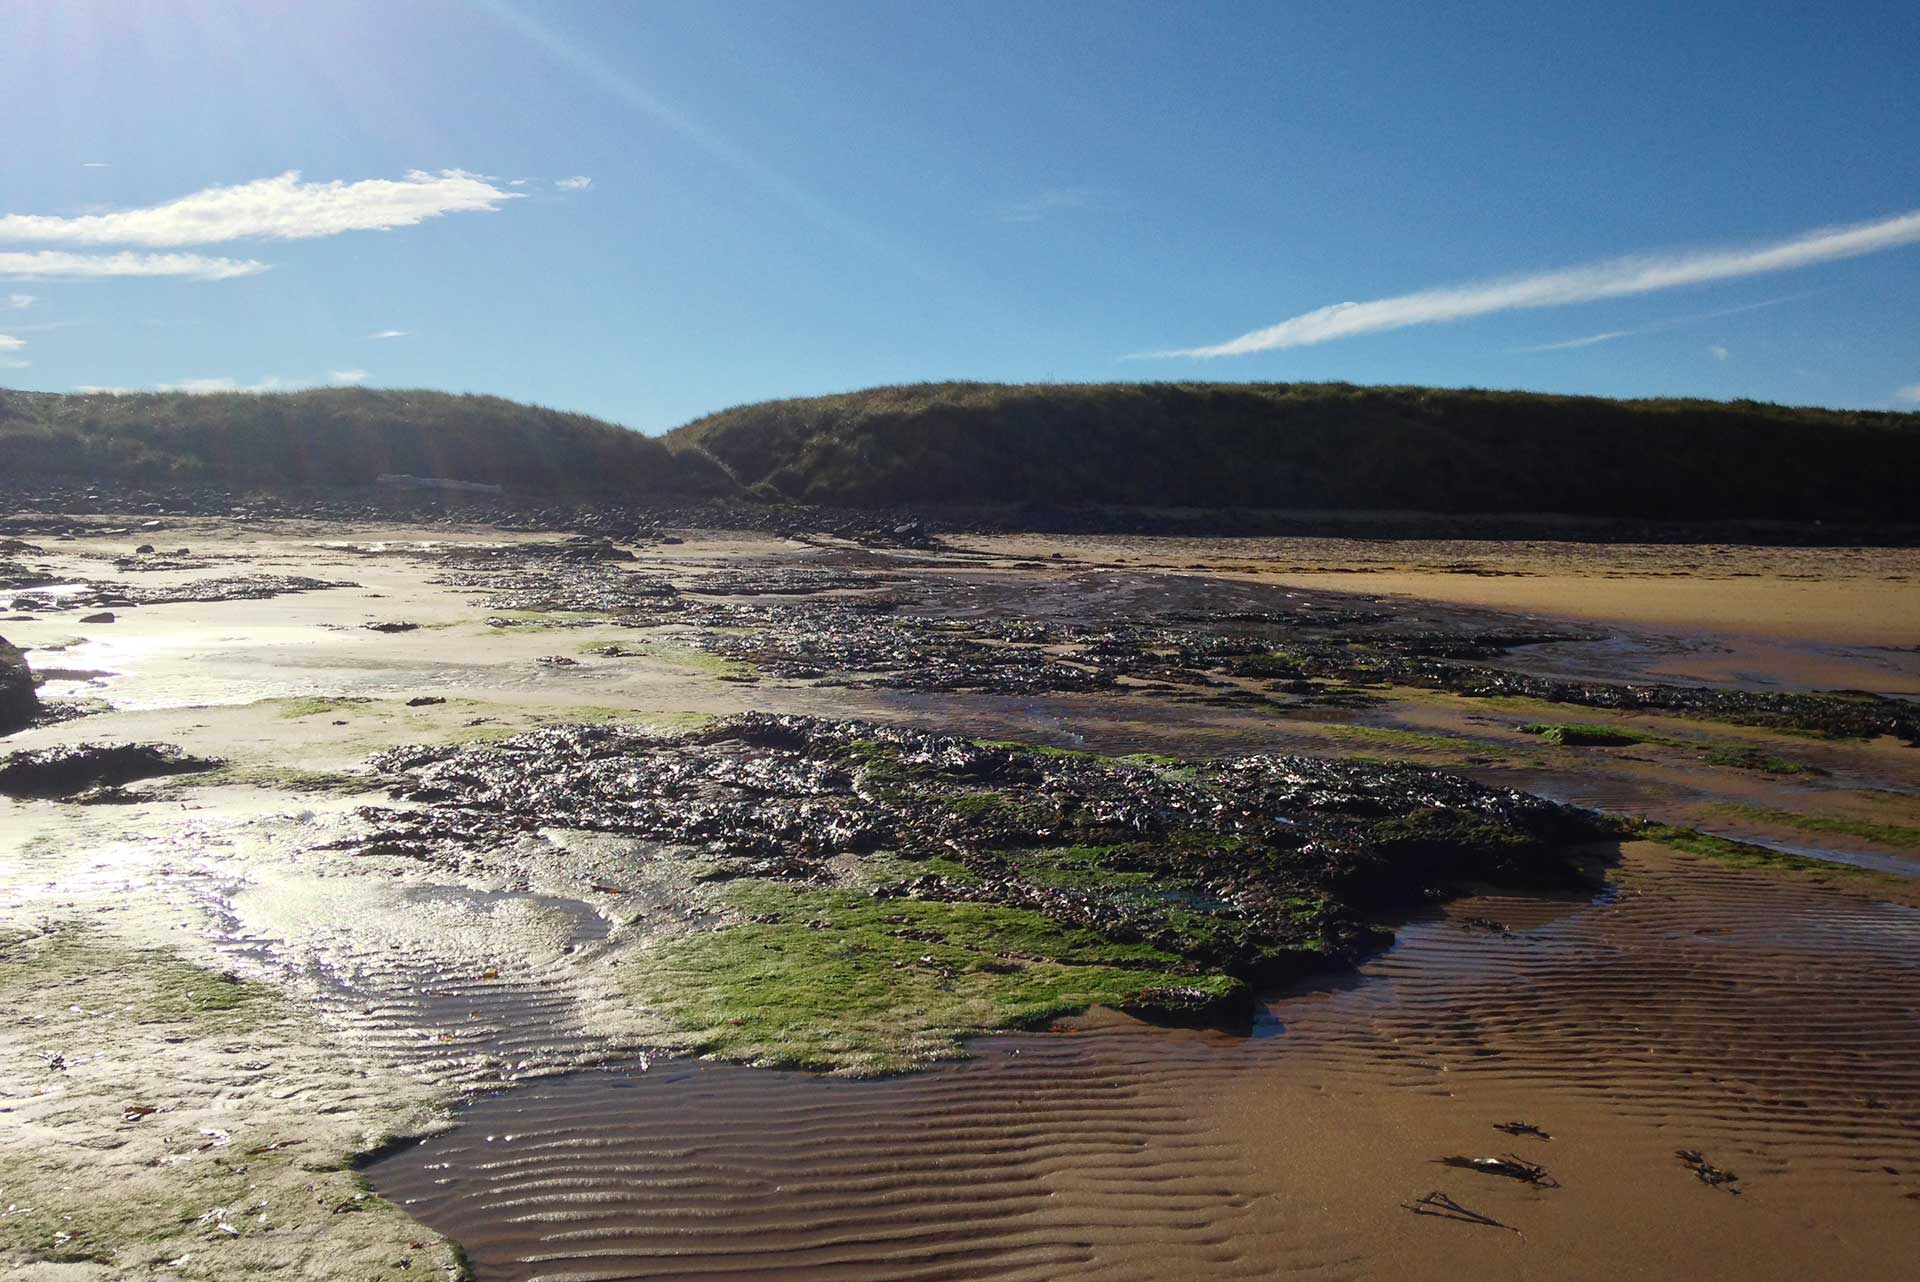 Rocks on beach at Embleton Bay